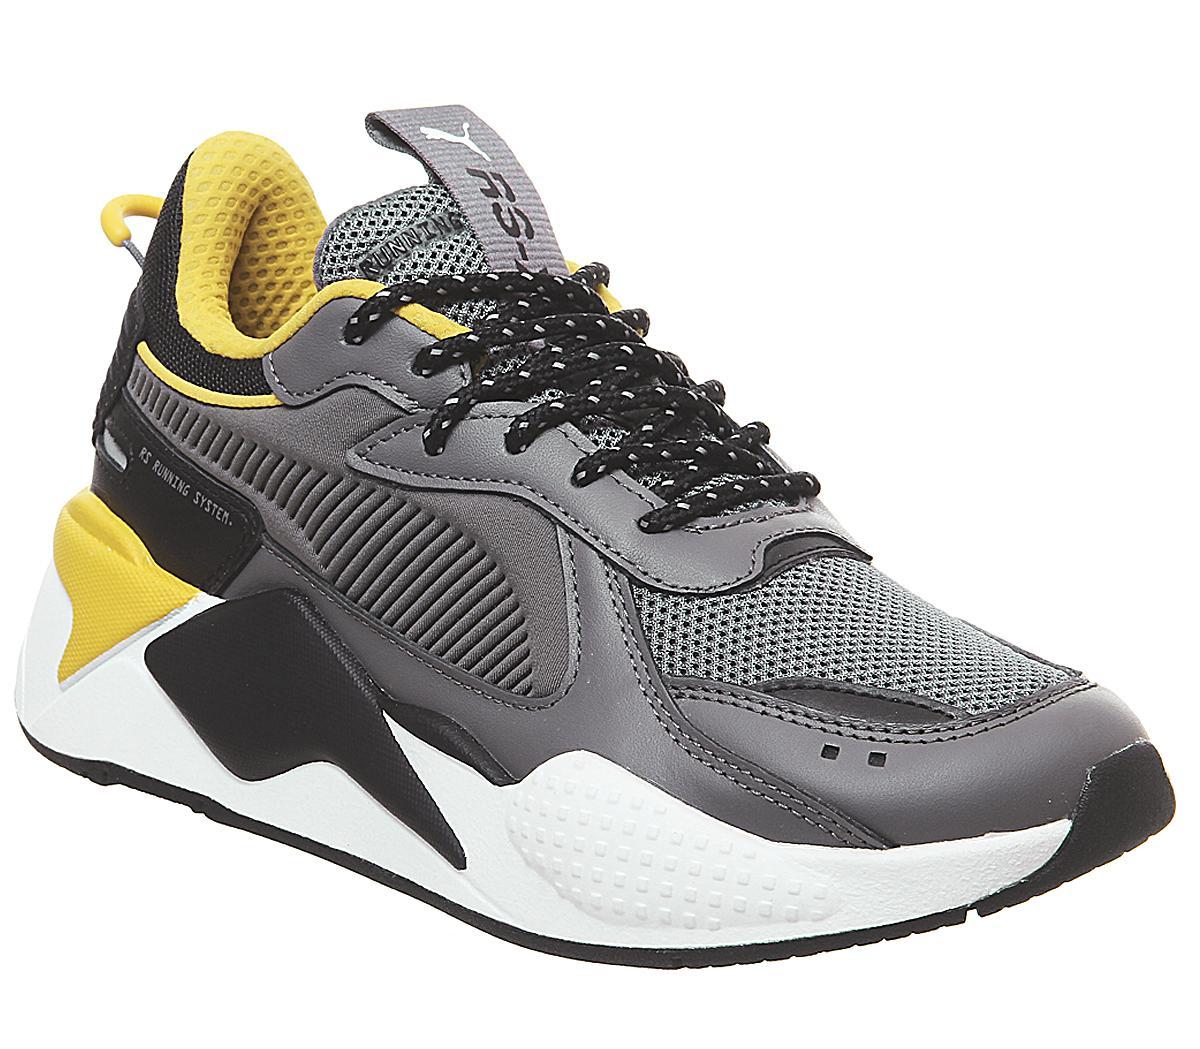 Puma Rs-x Core Castlerock - Unisex Sports